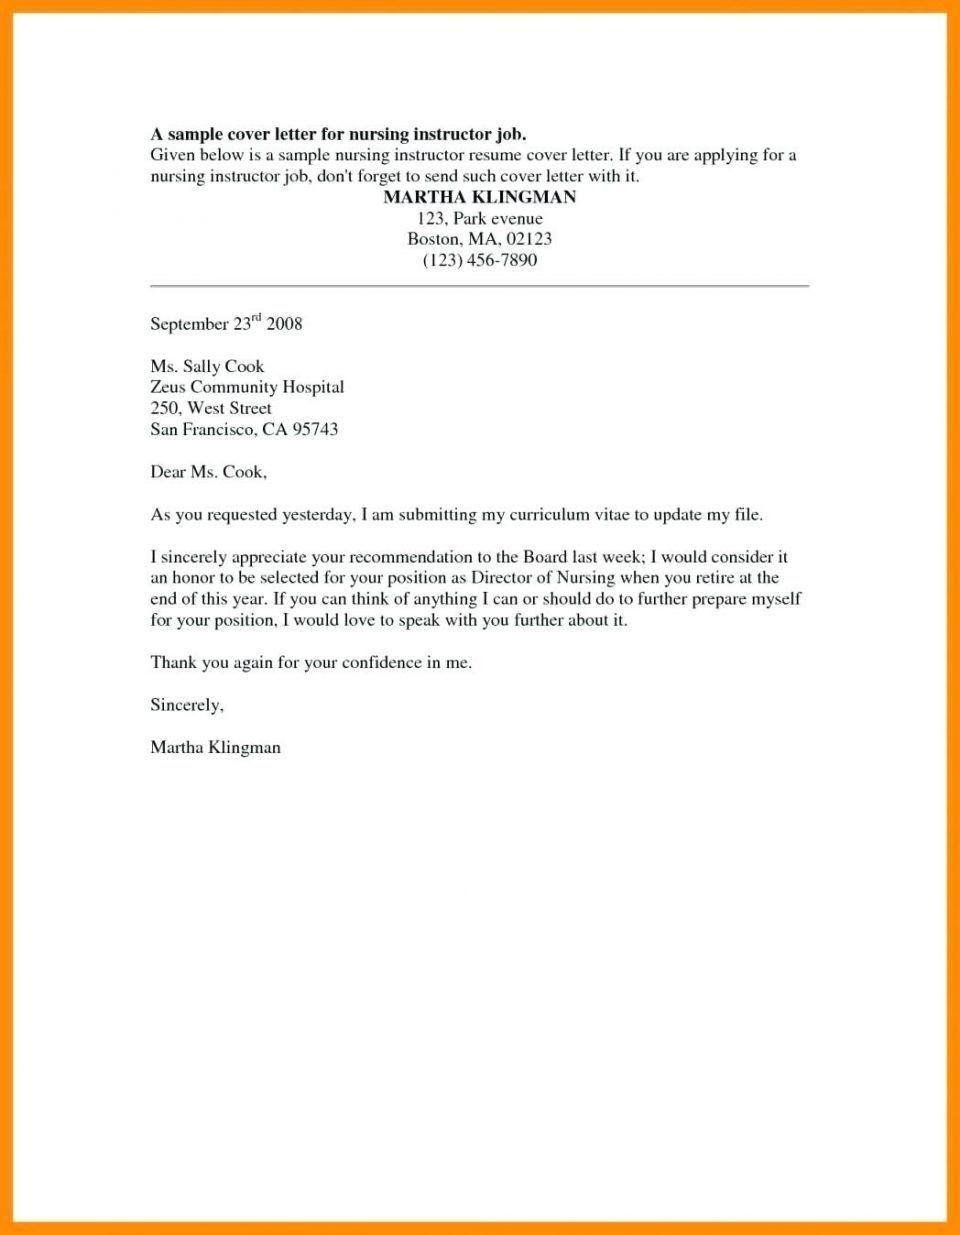 Nursing Student Resume Cover Letter Examples Sample Resume Cover